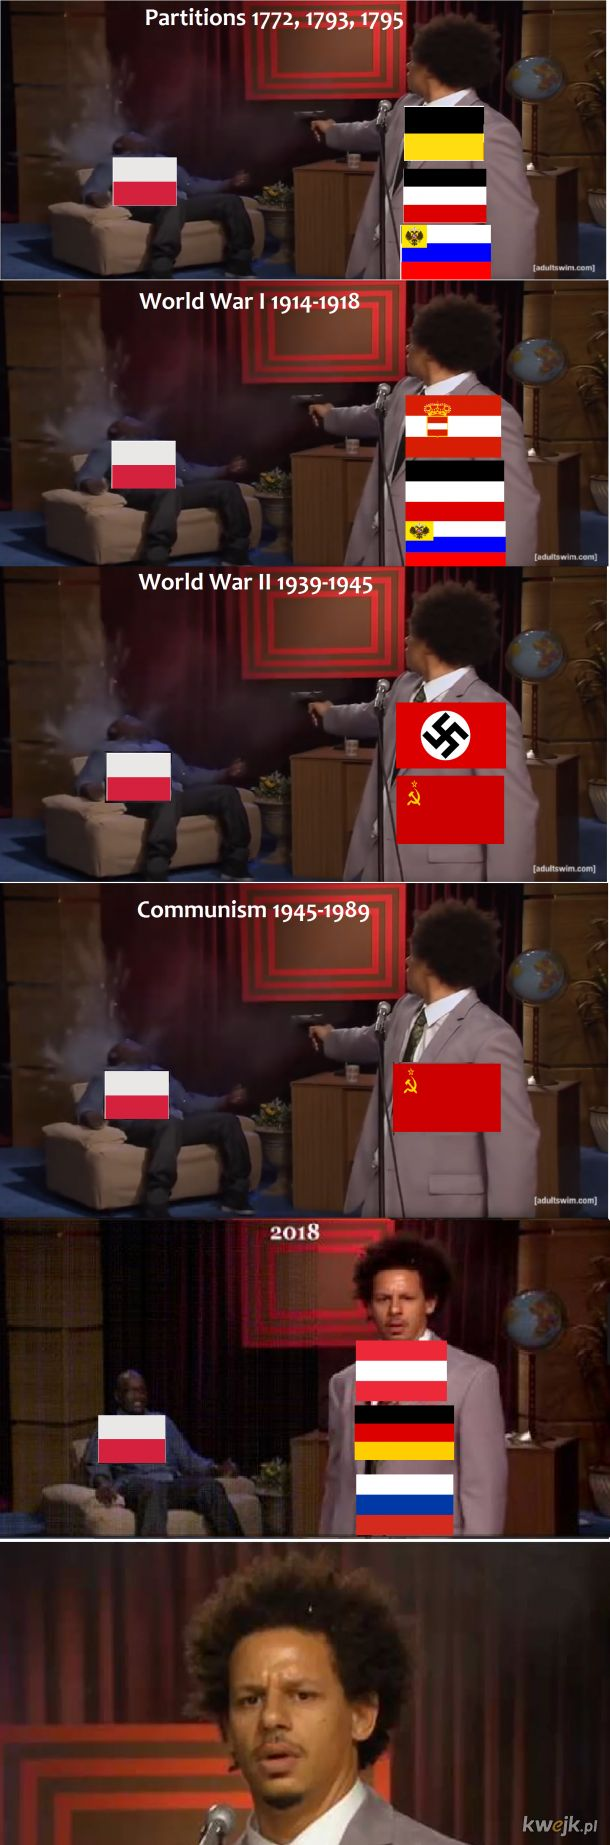 Polska nieśmiertelna :D